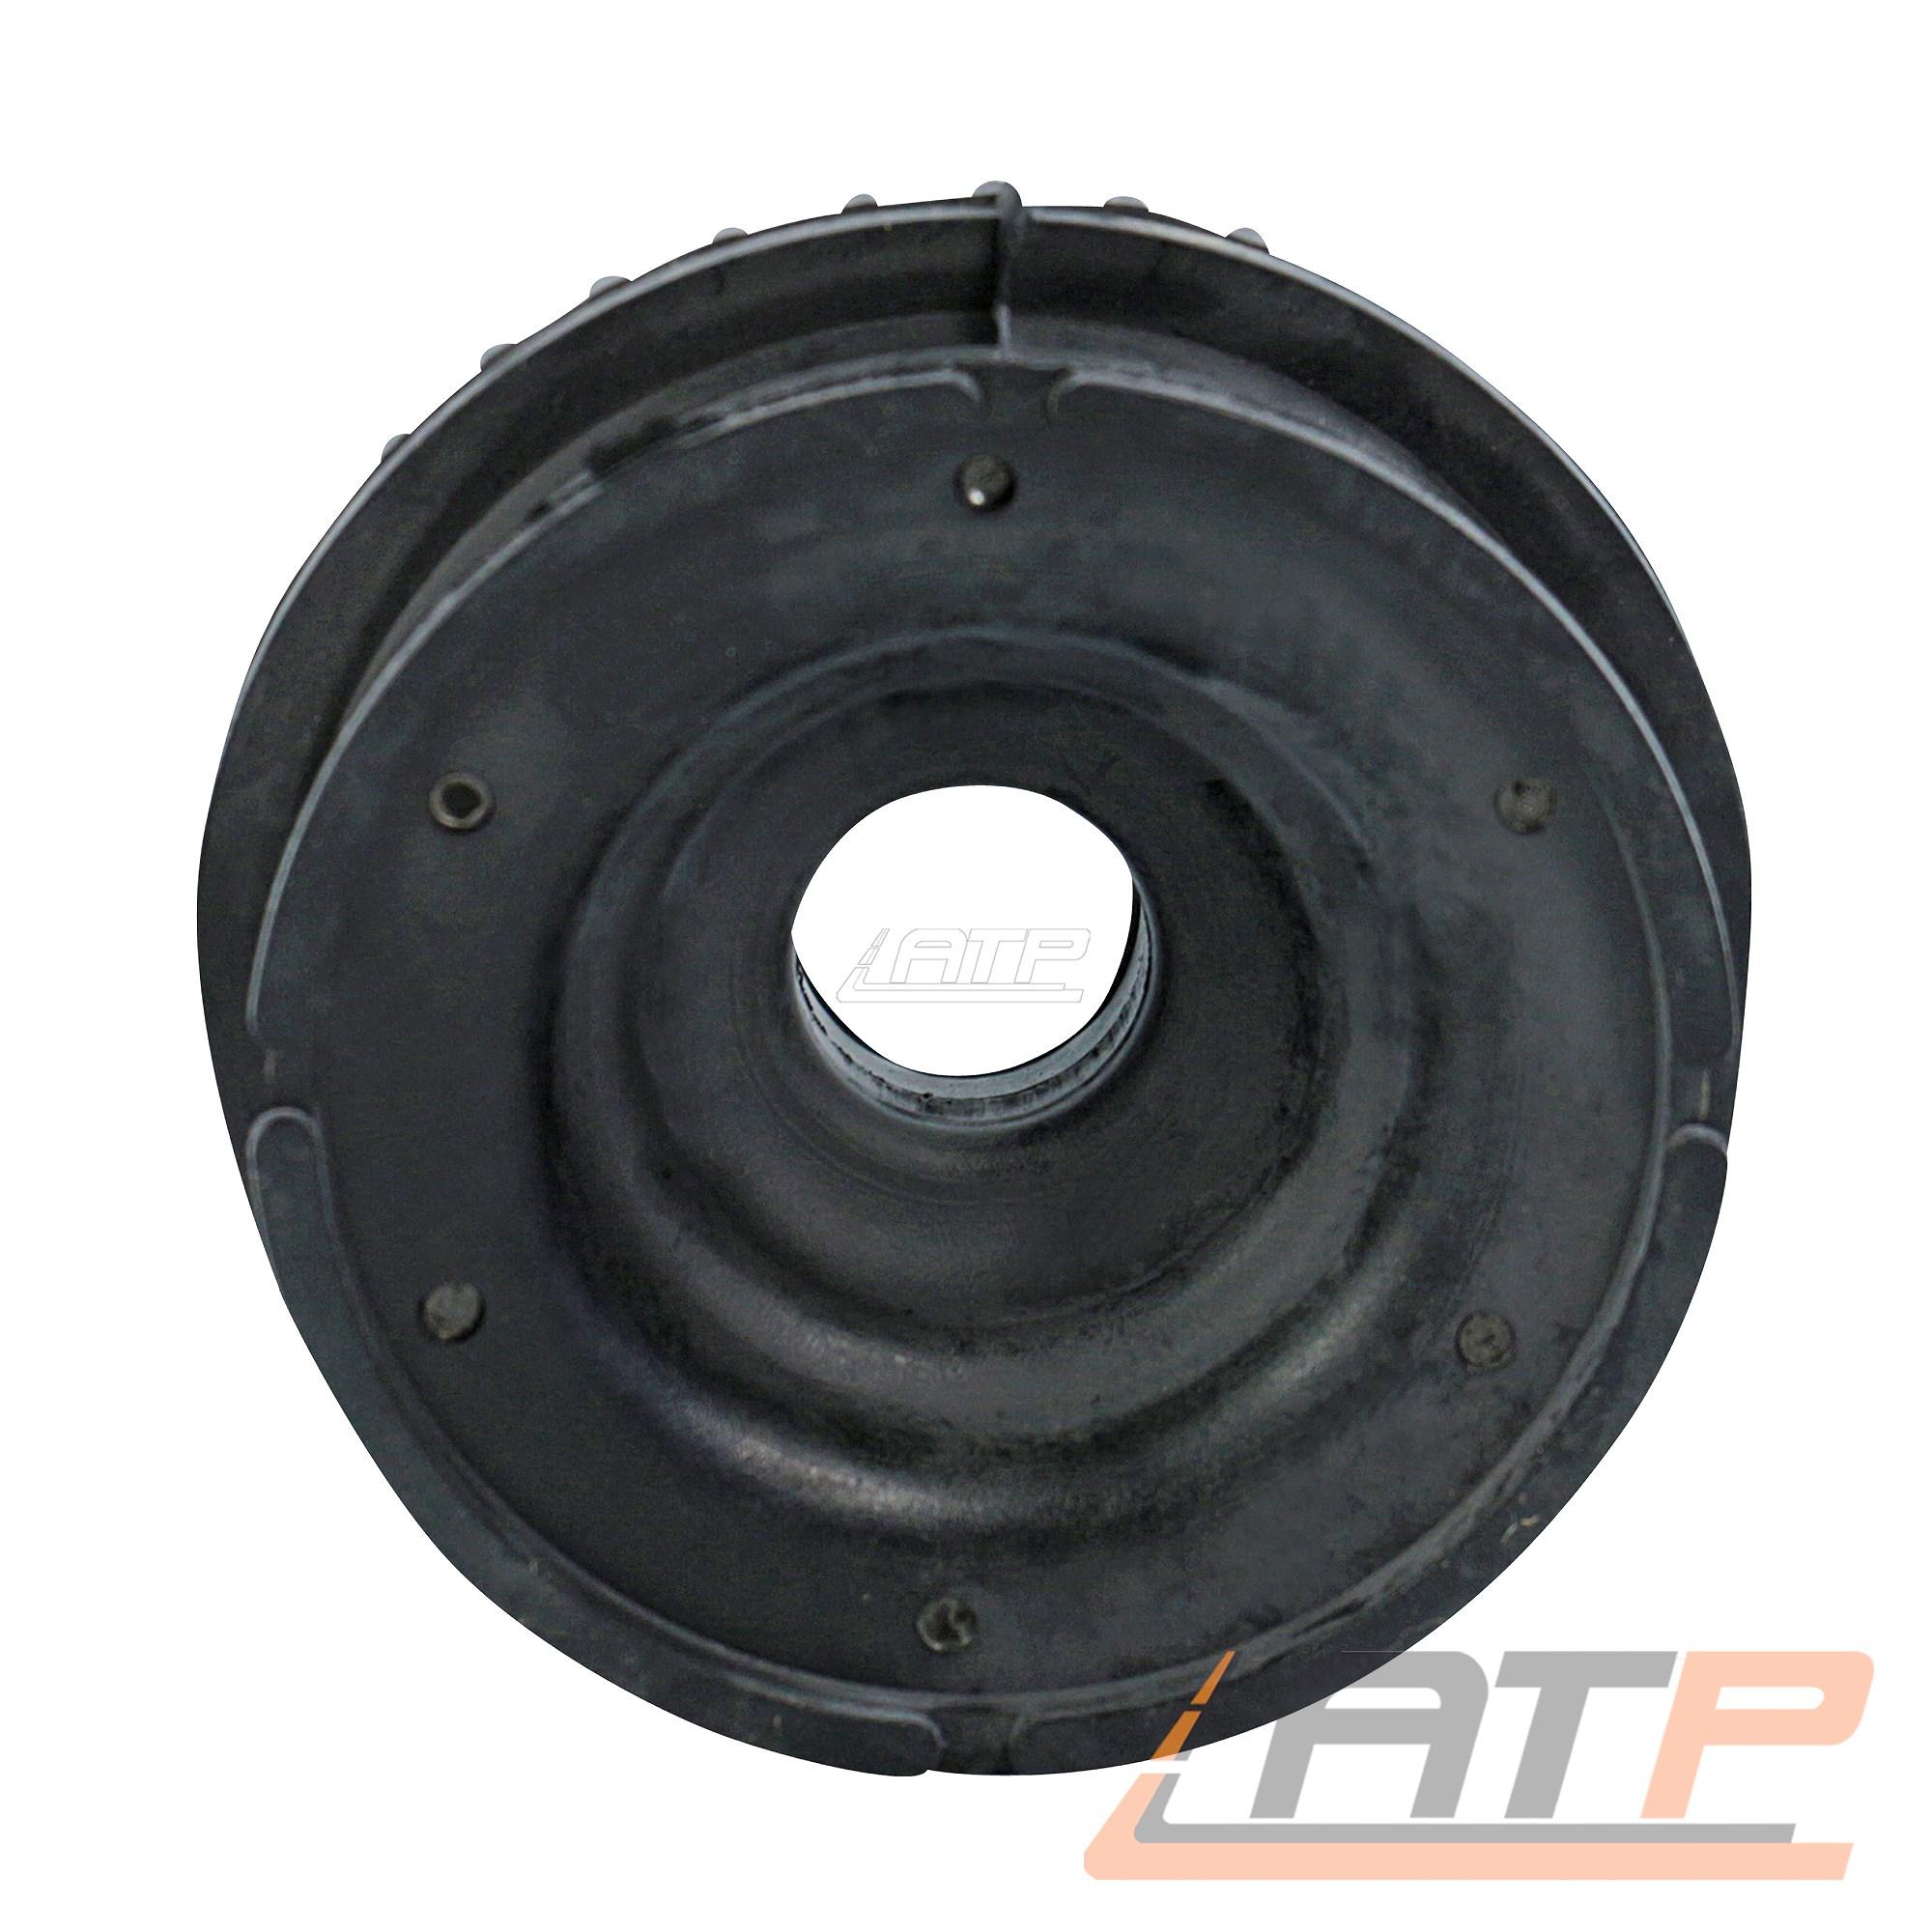 10x6,5 mm Potenza idraulica PU CHIARO TUBO 10 metri etputubek 10x6,5-10m